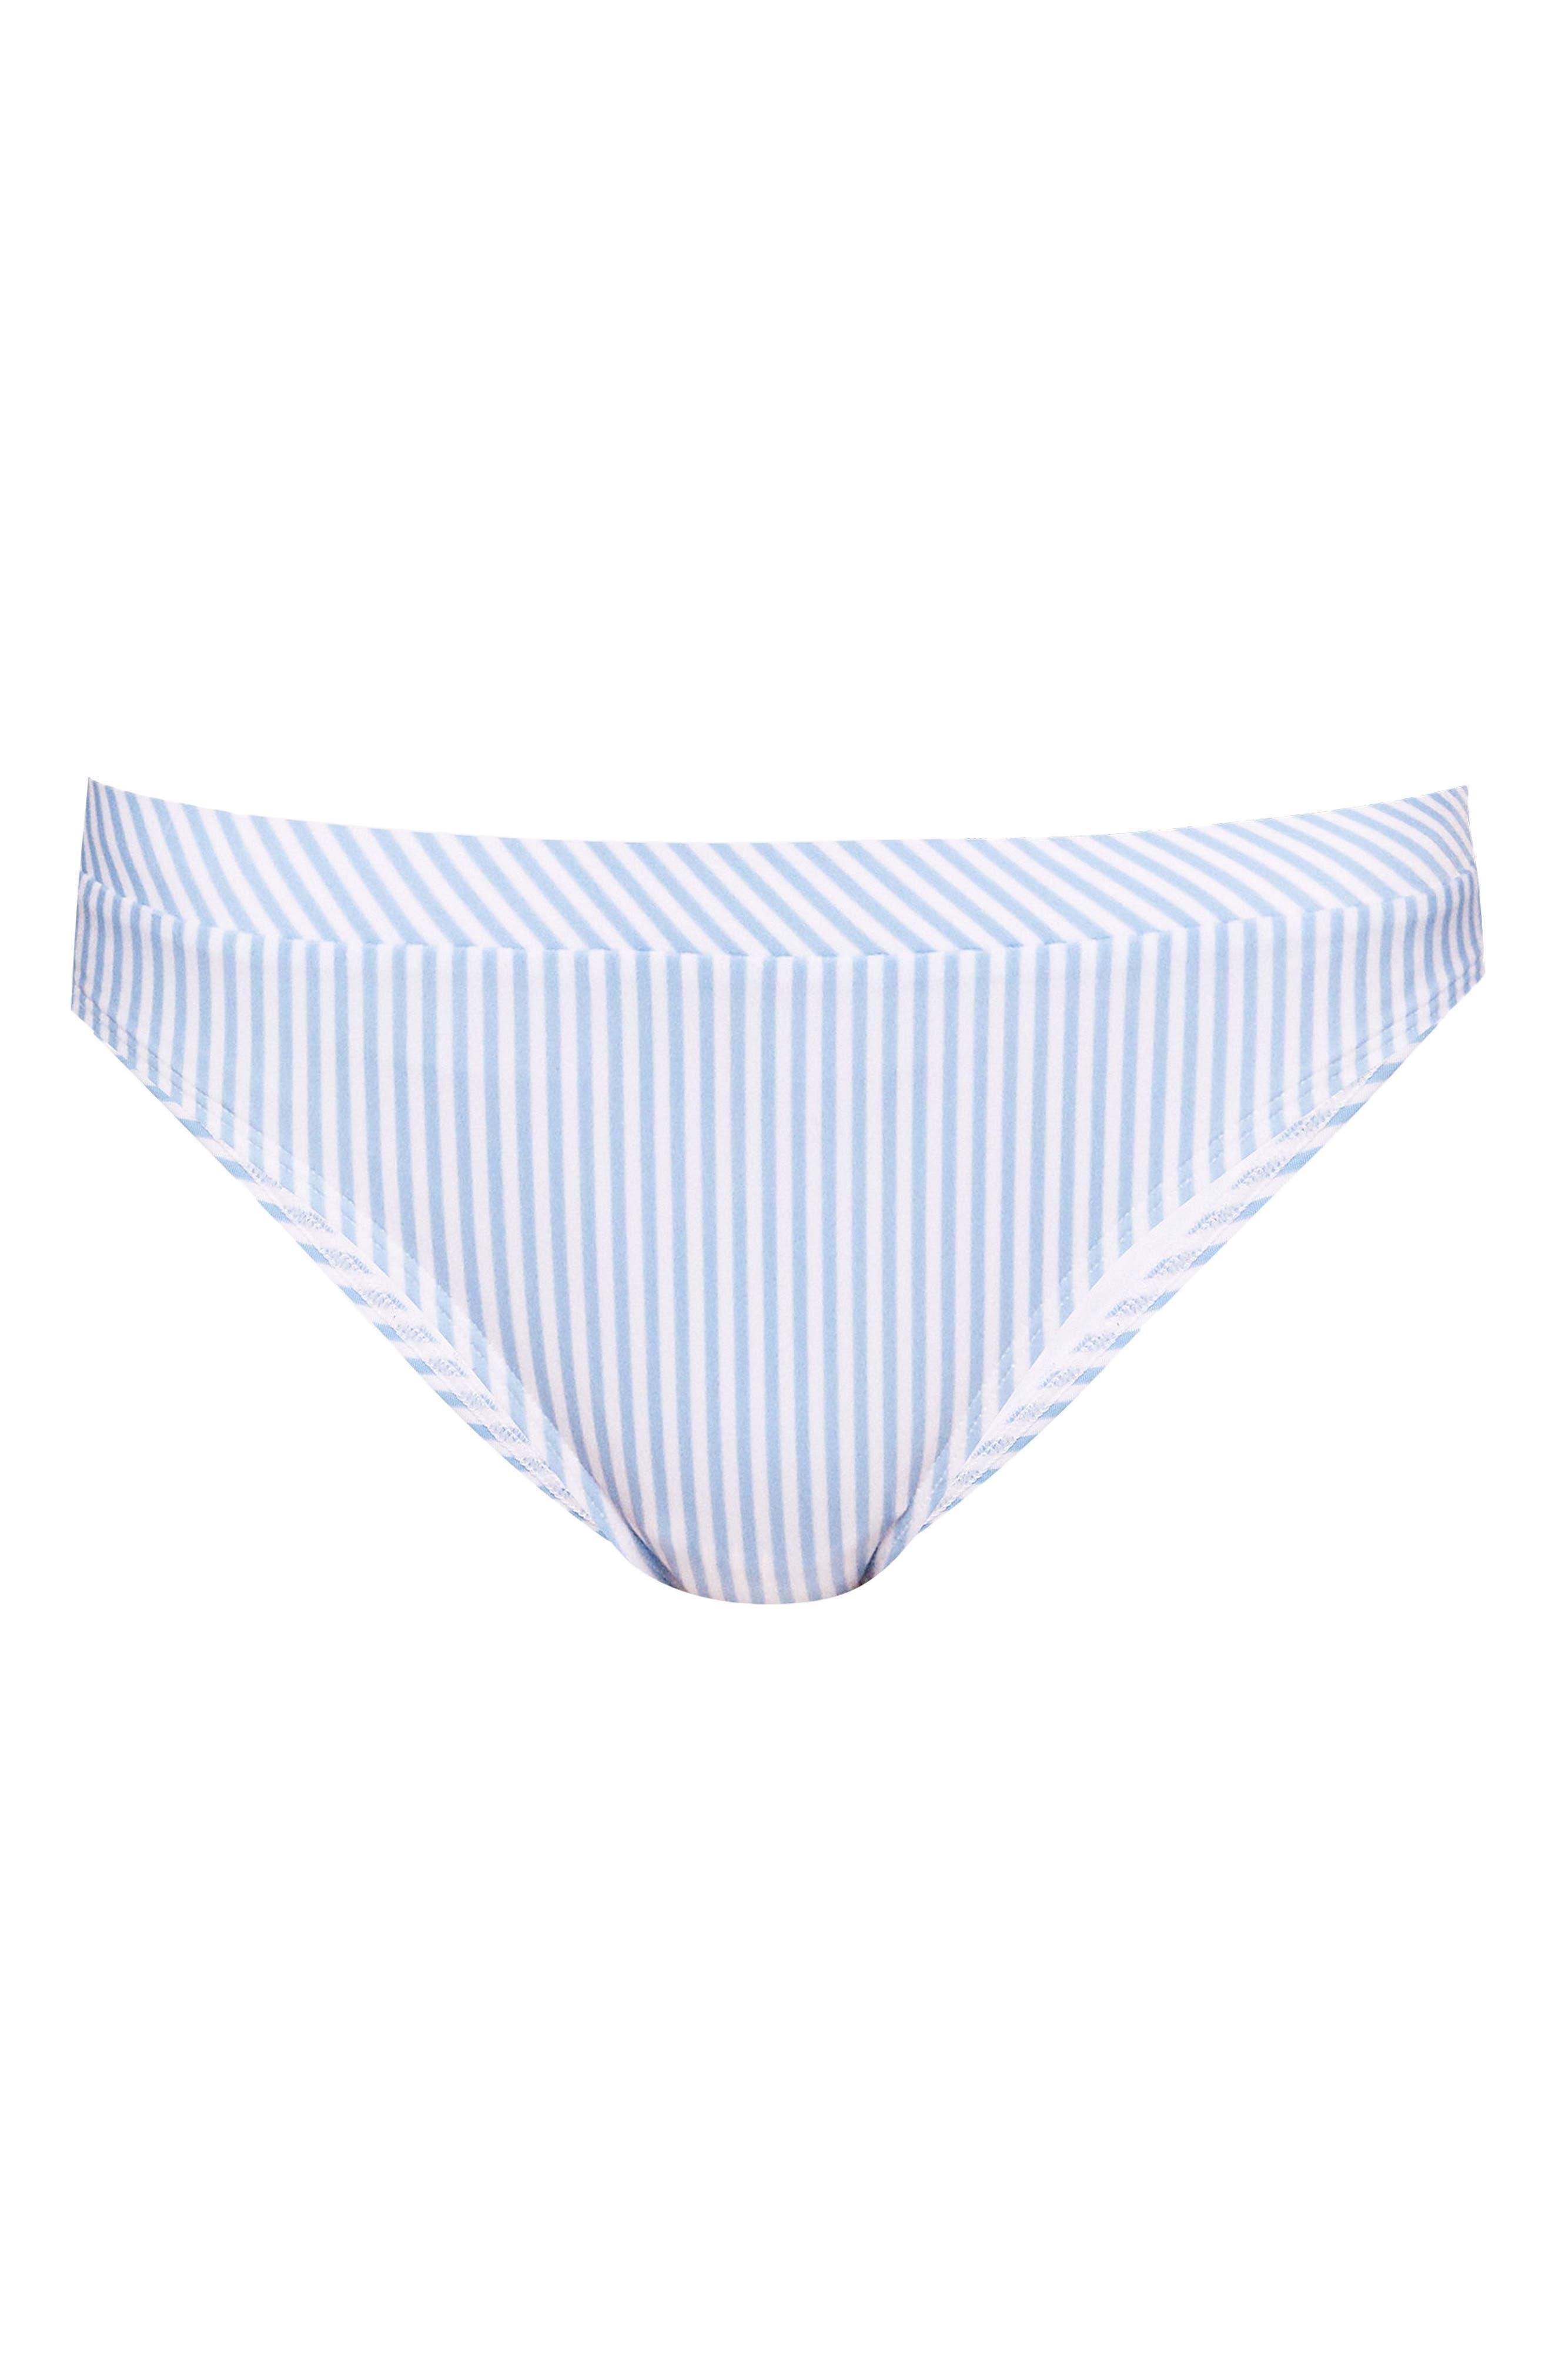 Stripe Bikini Bottoms,                             Alternate thumbnail 4, color,                             Pale Blue